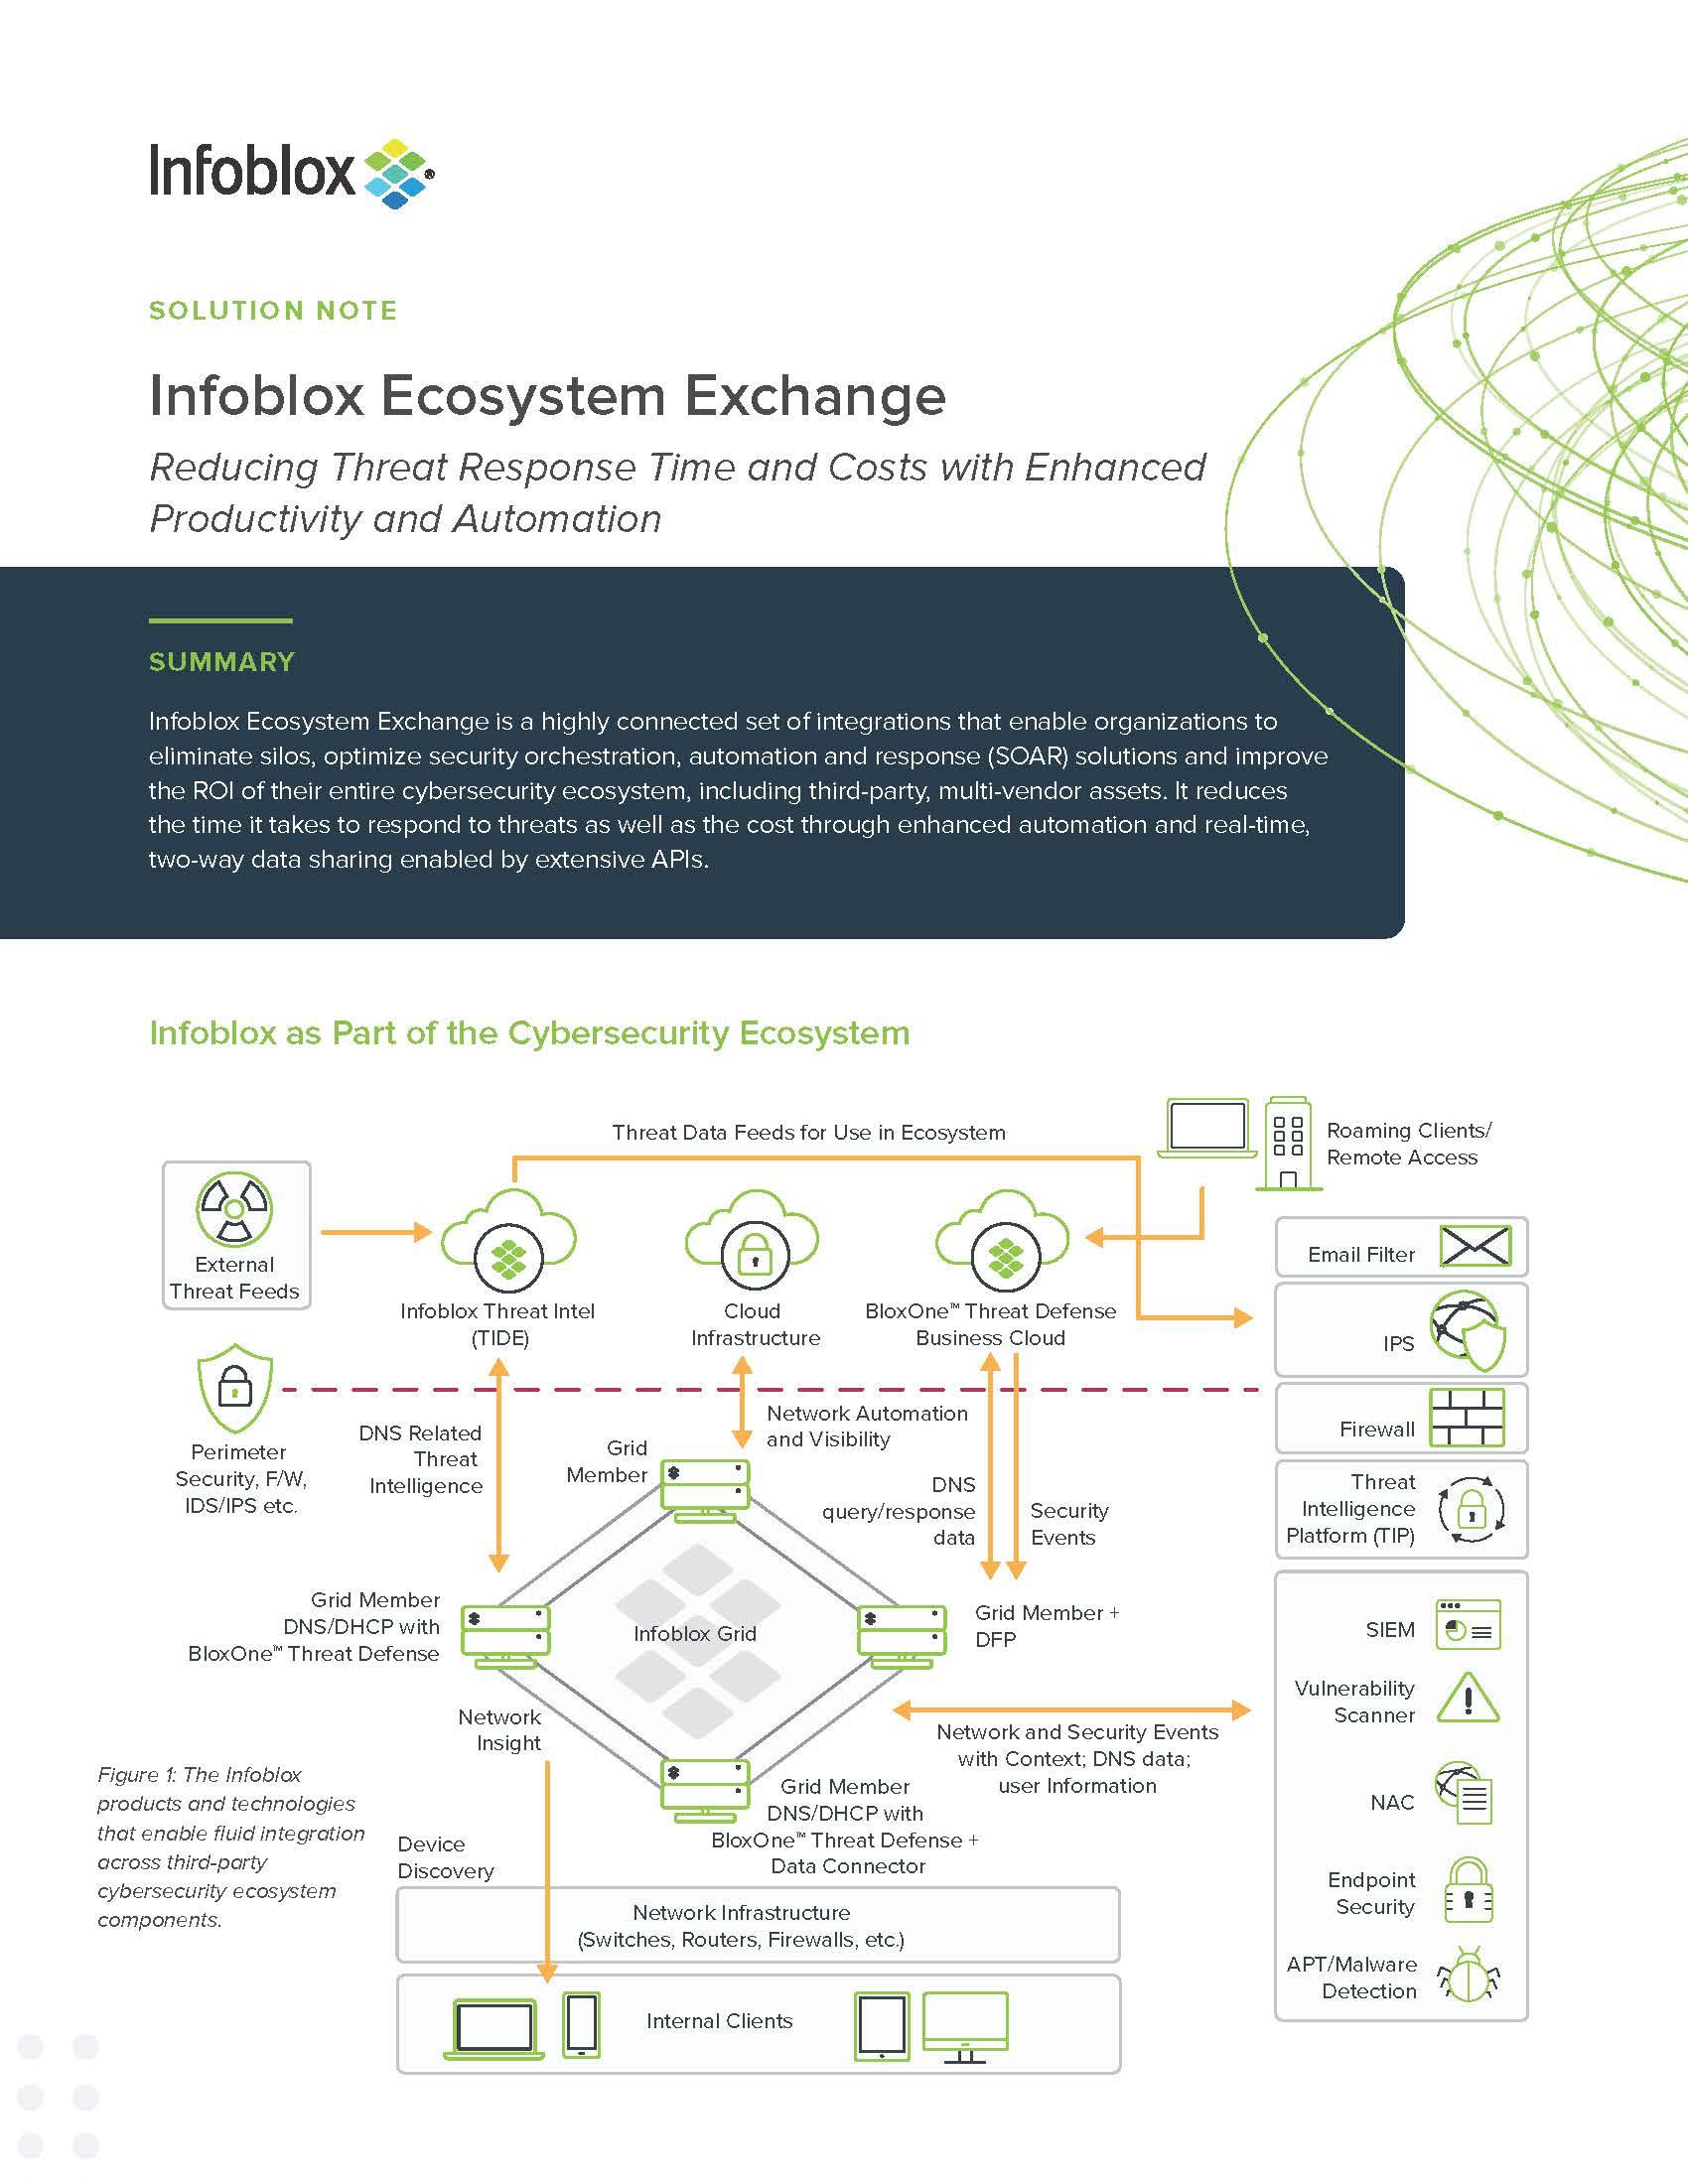 Infoblox Ecosystem Exchange